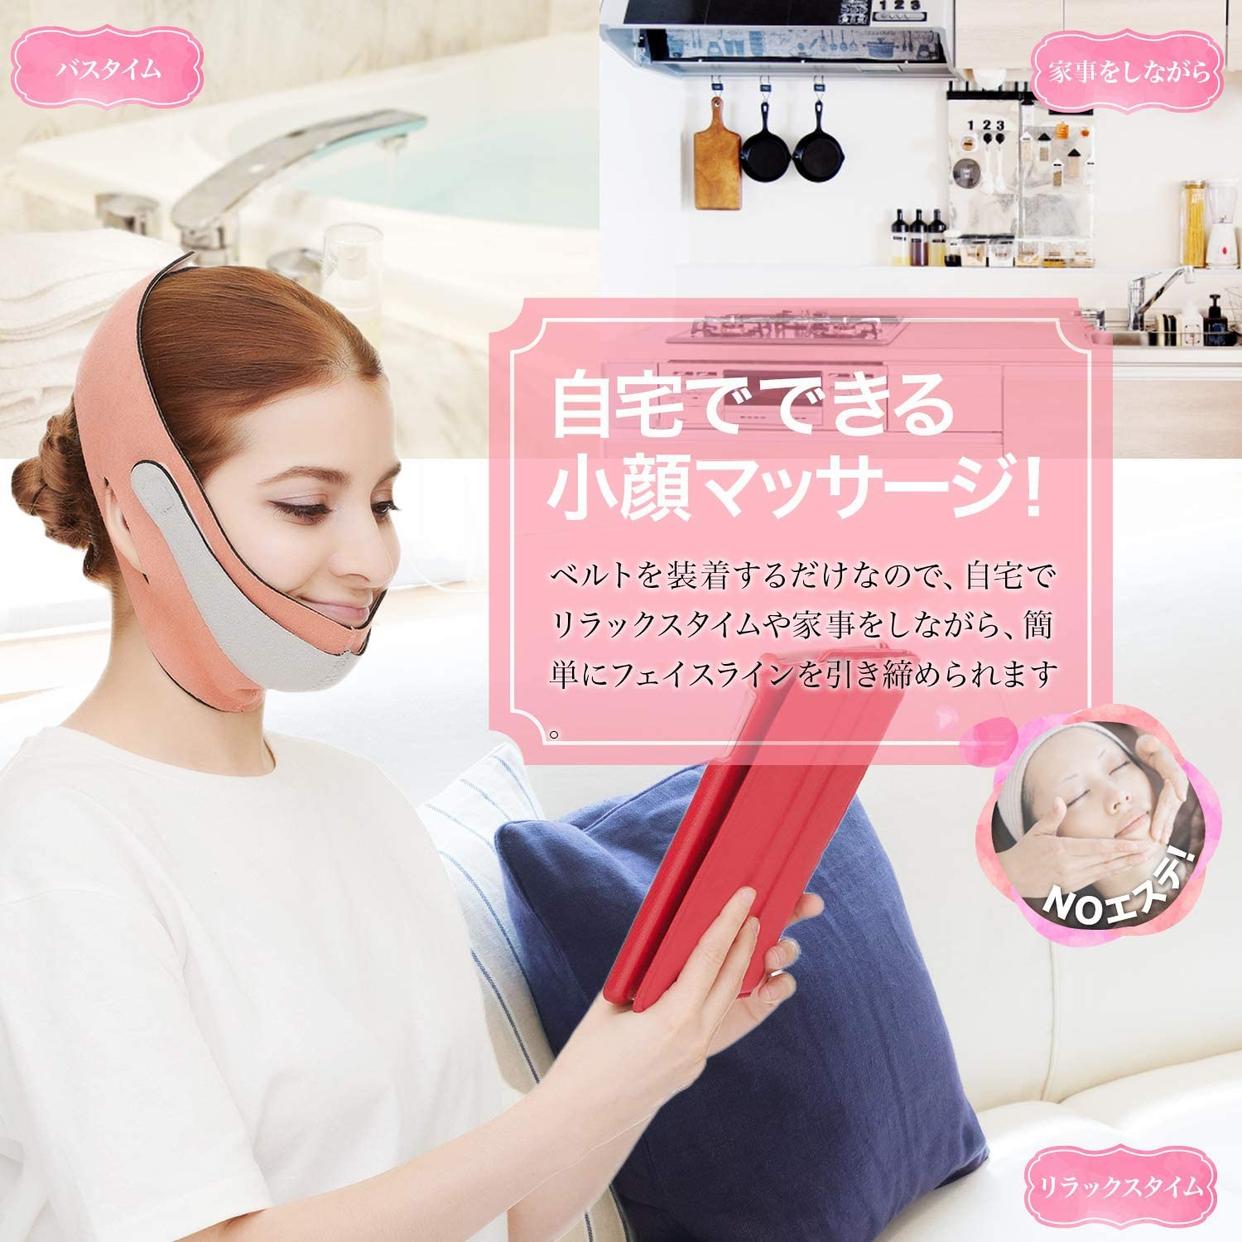 PLEASINGSAN(プリージングサン) 【改良版】 小顔 矯正ベルトの商品画像3